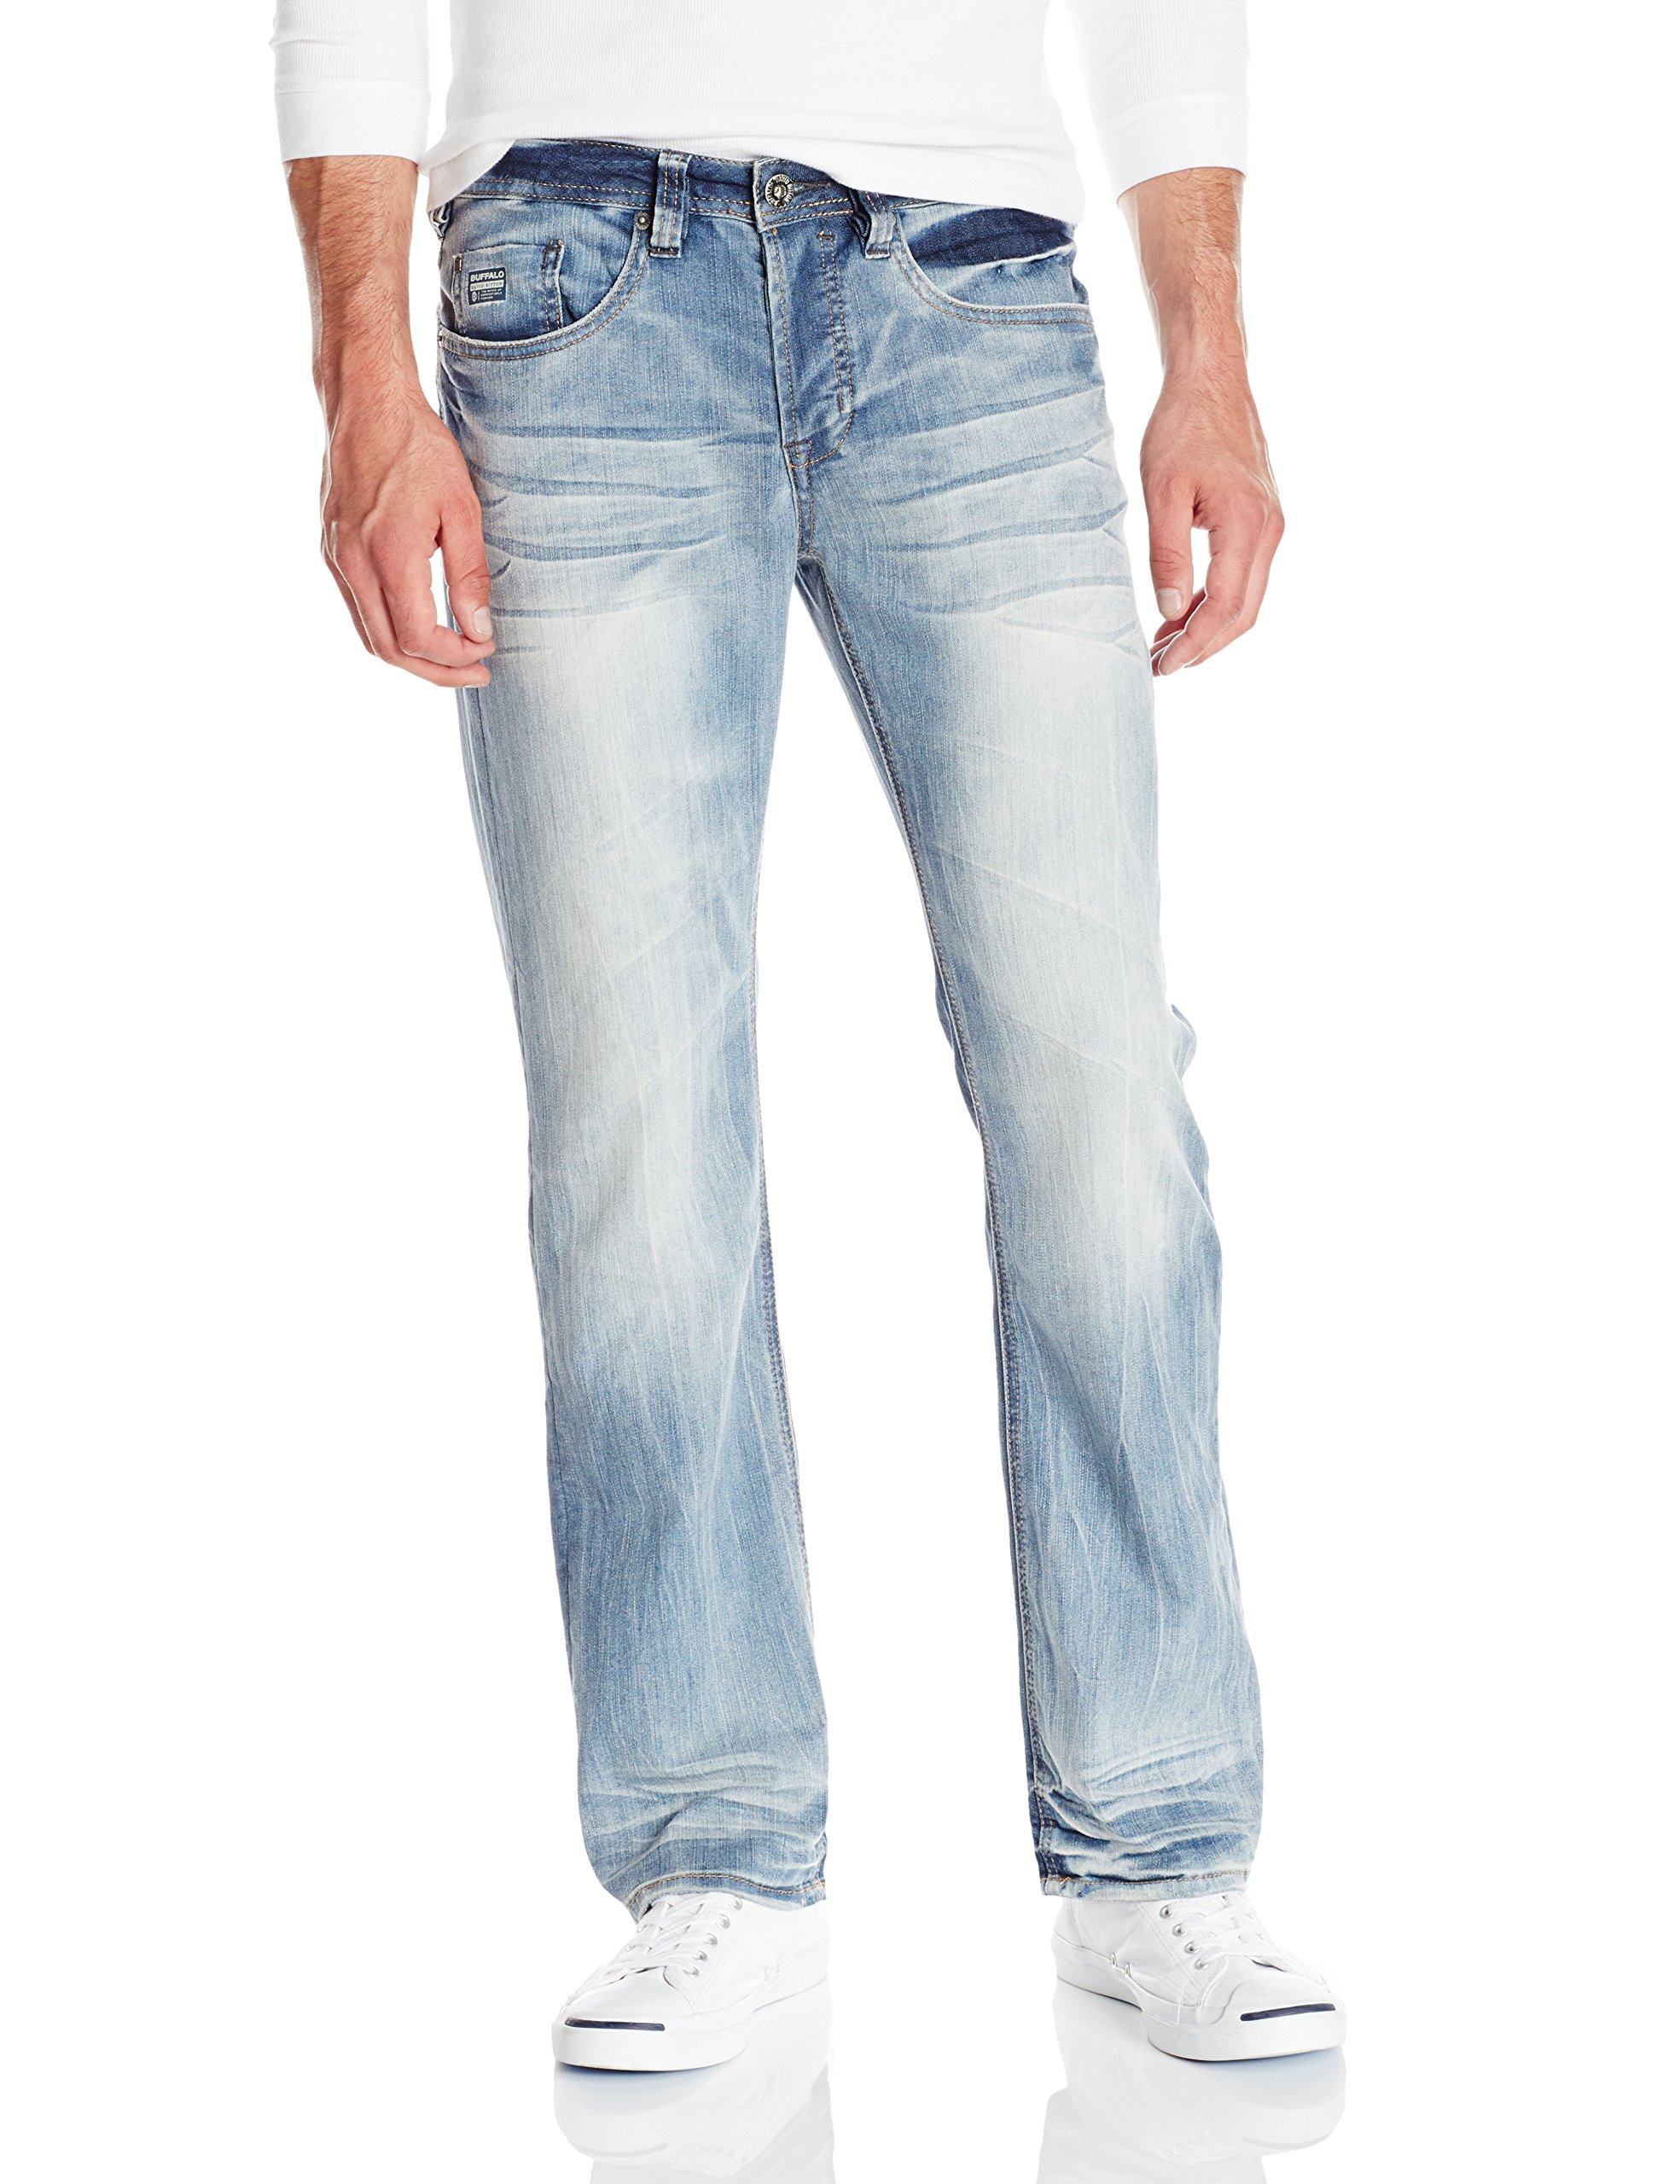 Buffalo David Bitton Men's King Slim Fit Bootcut Jean, Heavy Sandblasted, 33x34